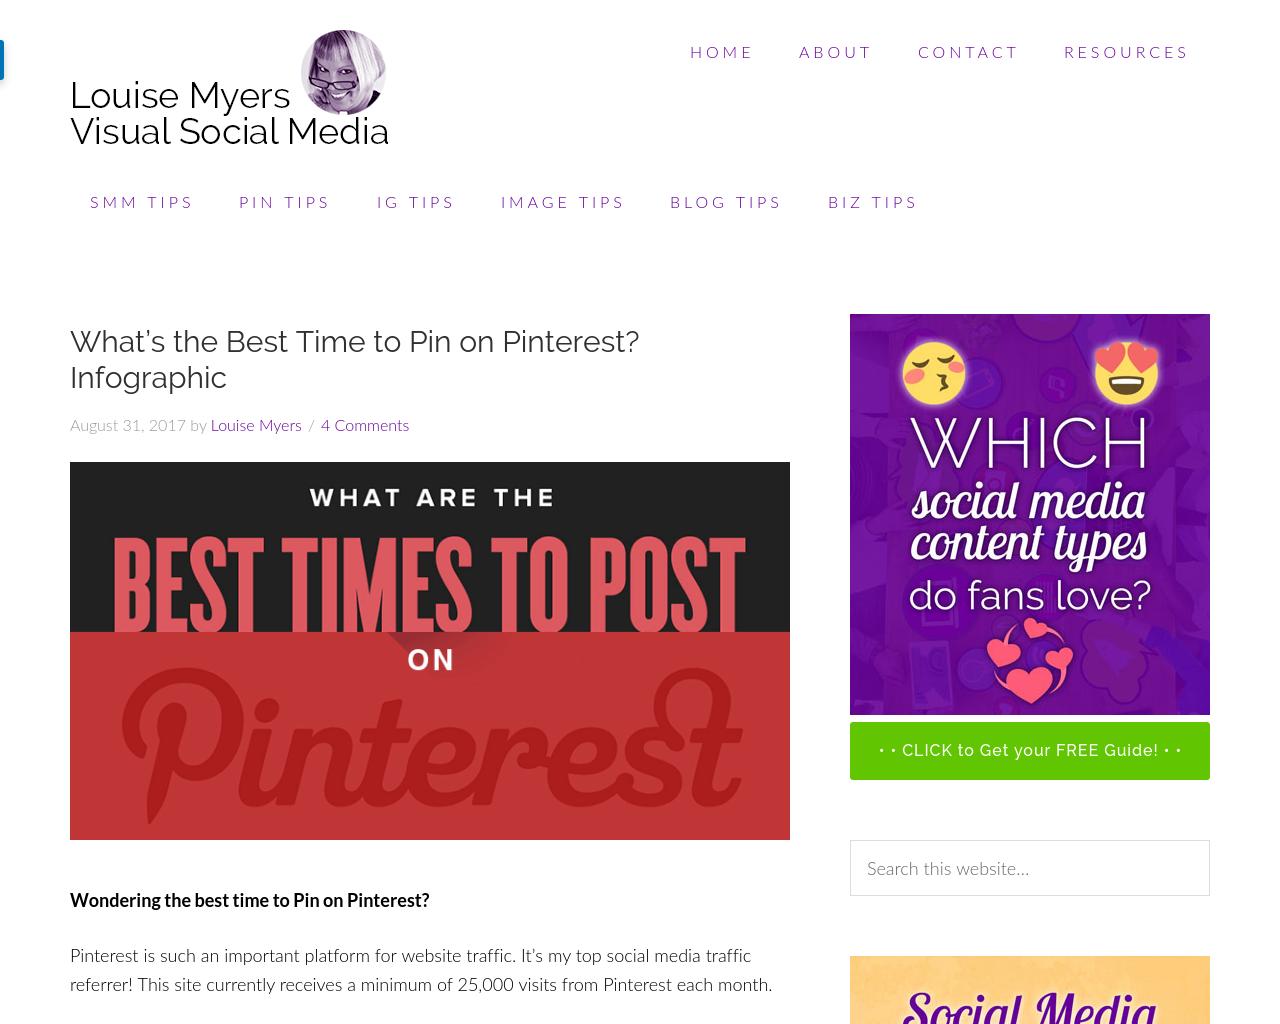 Louise-Myers-Visual-Social-Media-Advertising-Reviews-Pricing